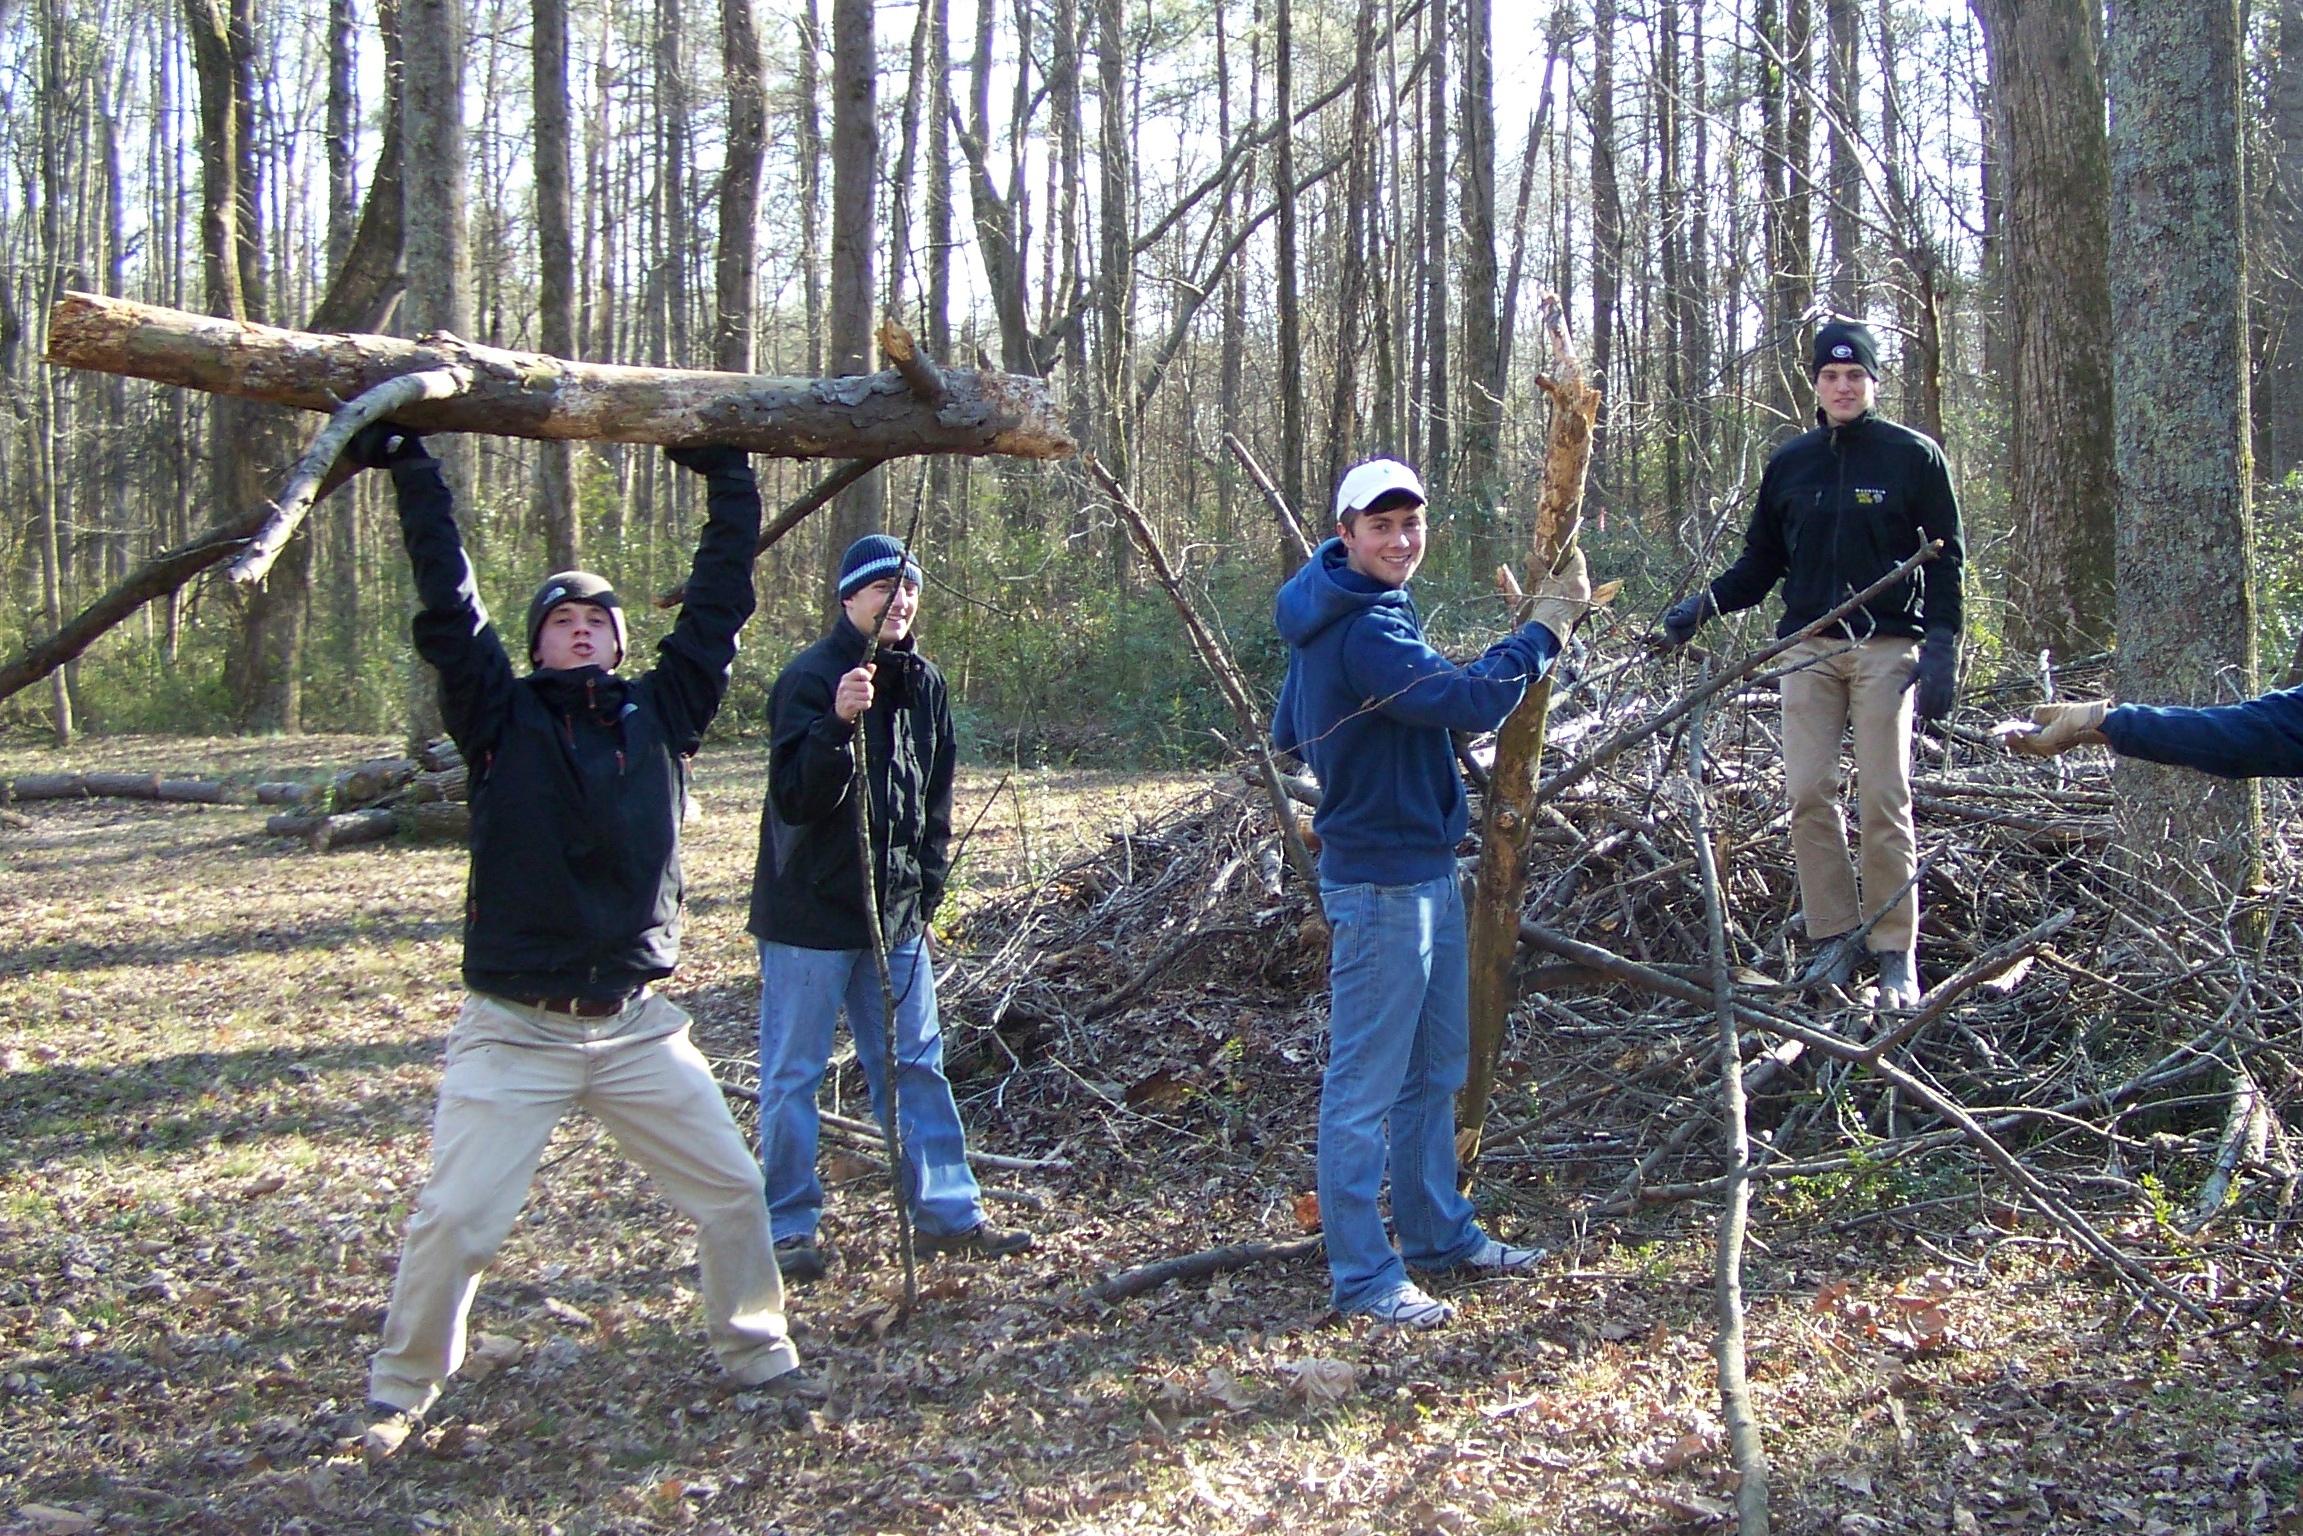 06 Guys in yard 100_8829 - Version 2.JPG